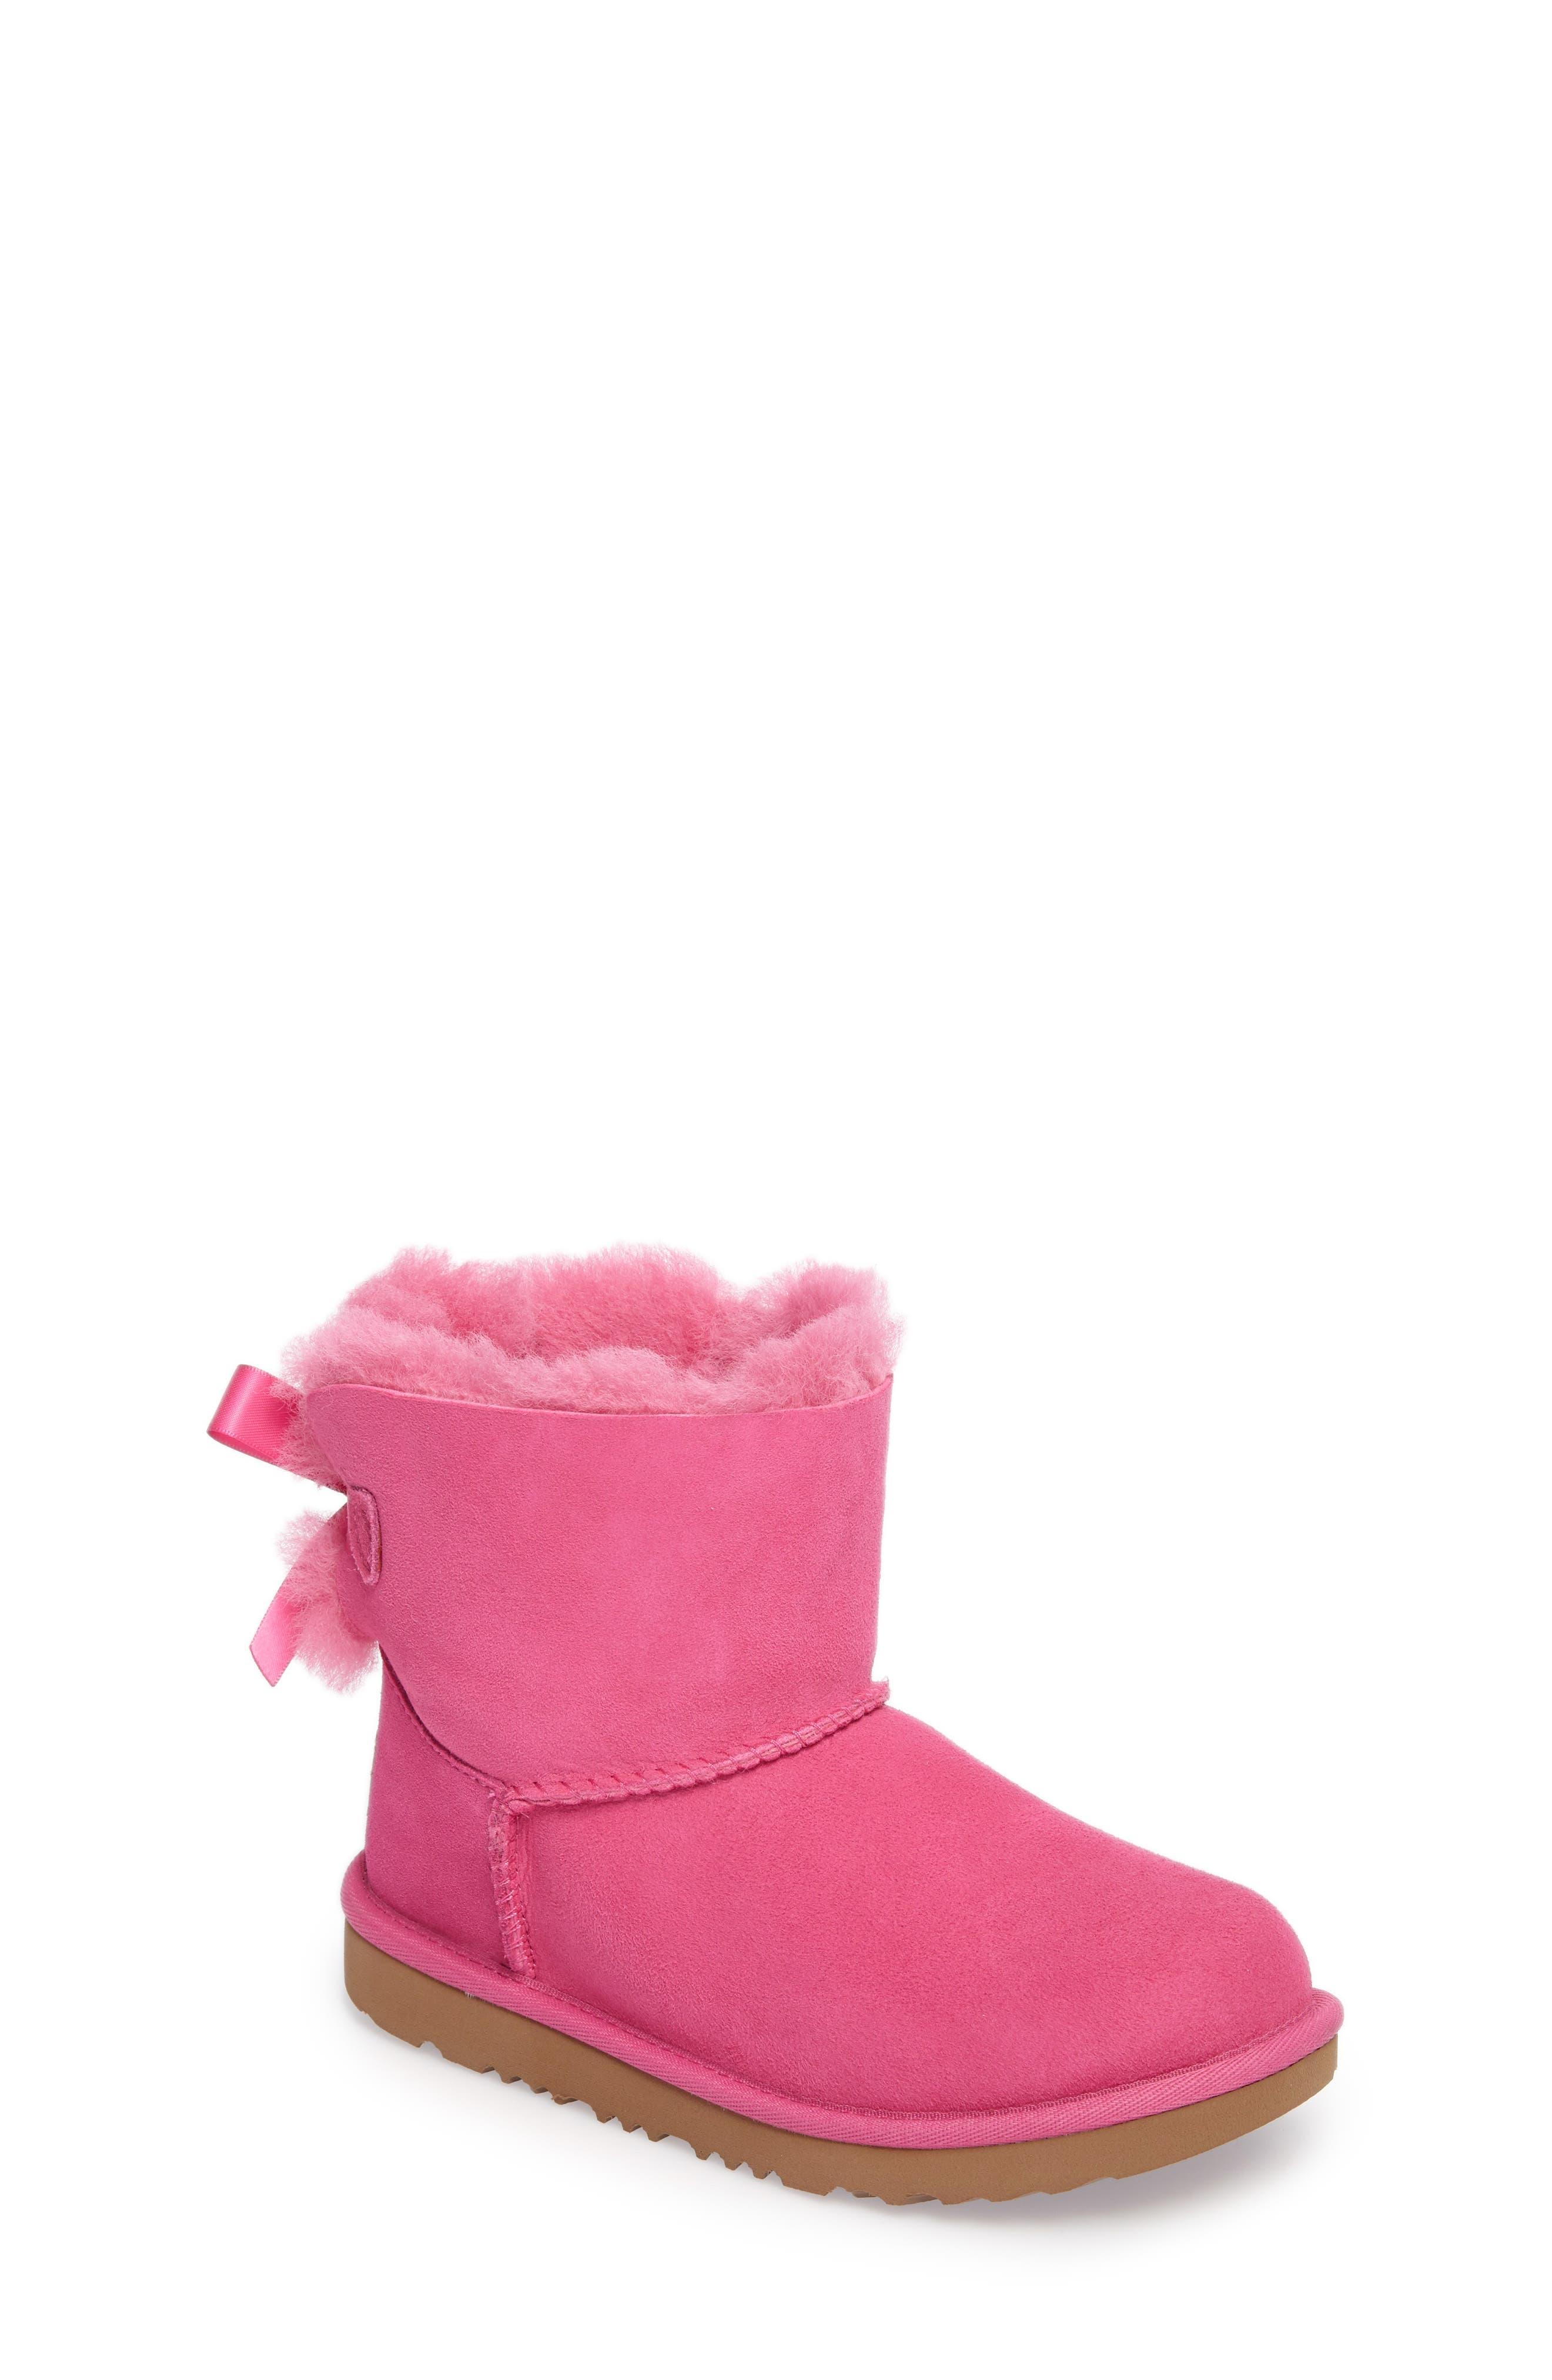 UGG<SUP>®</SUP>, Mini Bailey Bow II Water Resistant Boot, Main thumbnail 1, color, PINK AZALEA